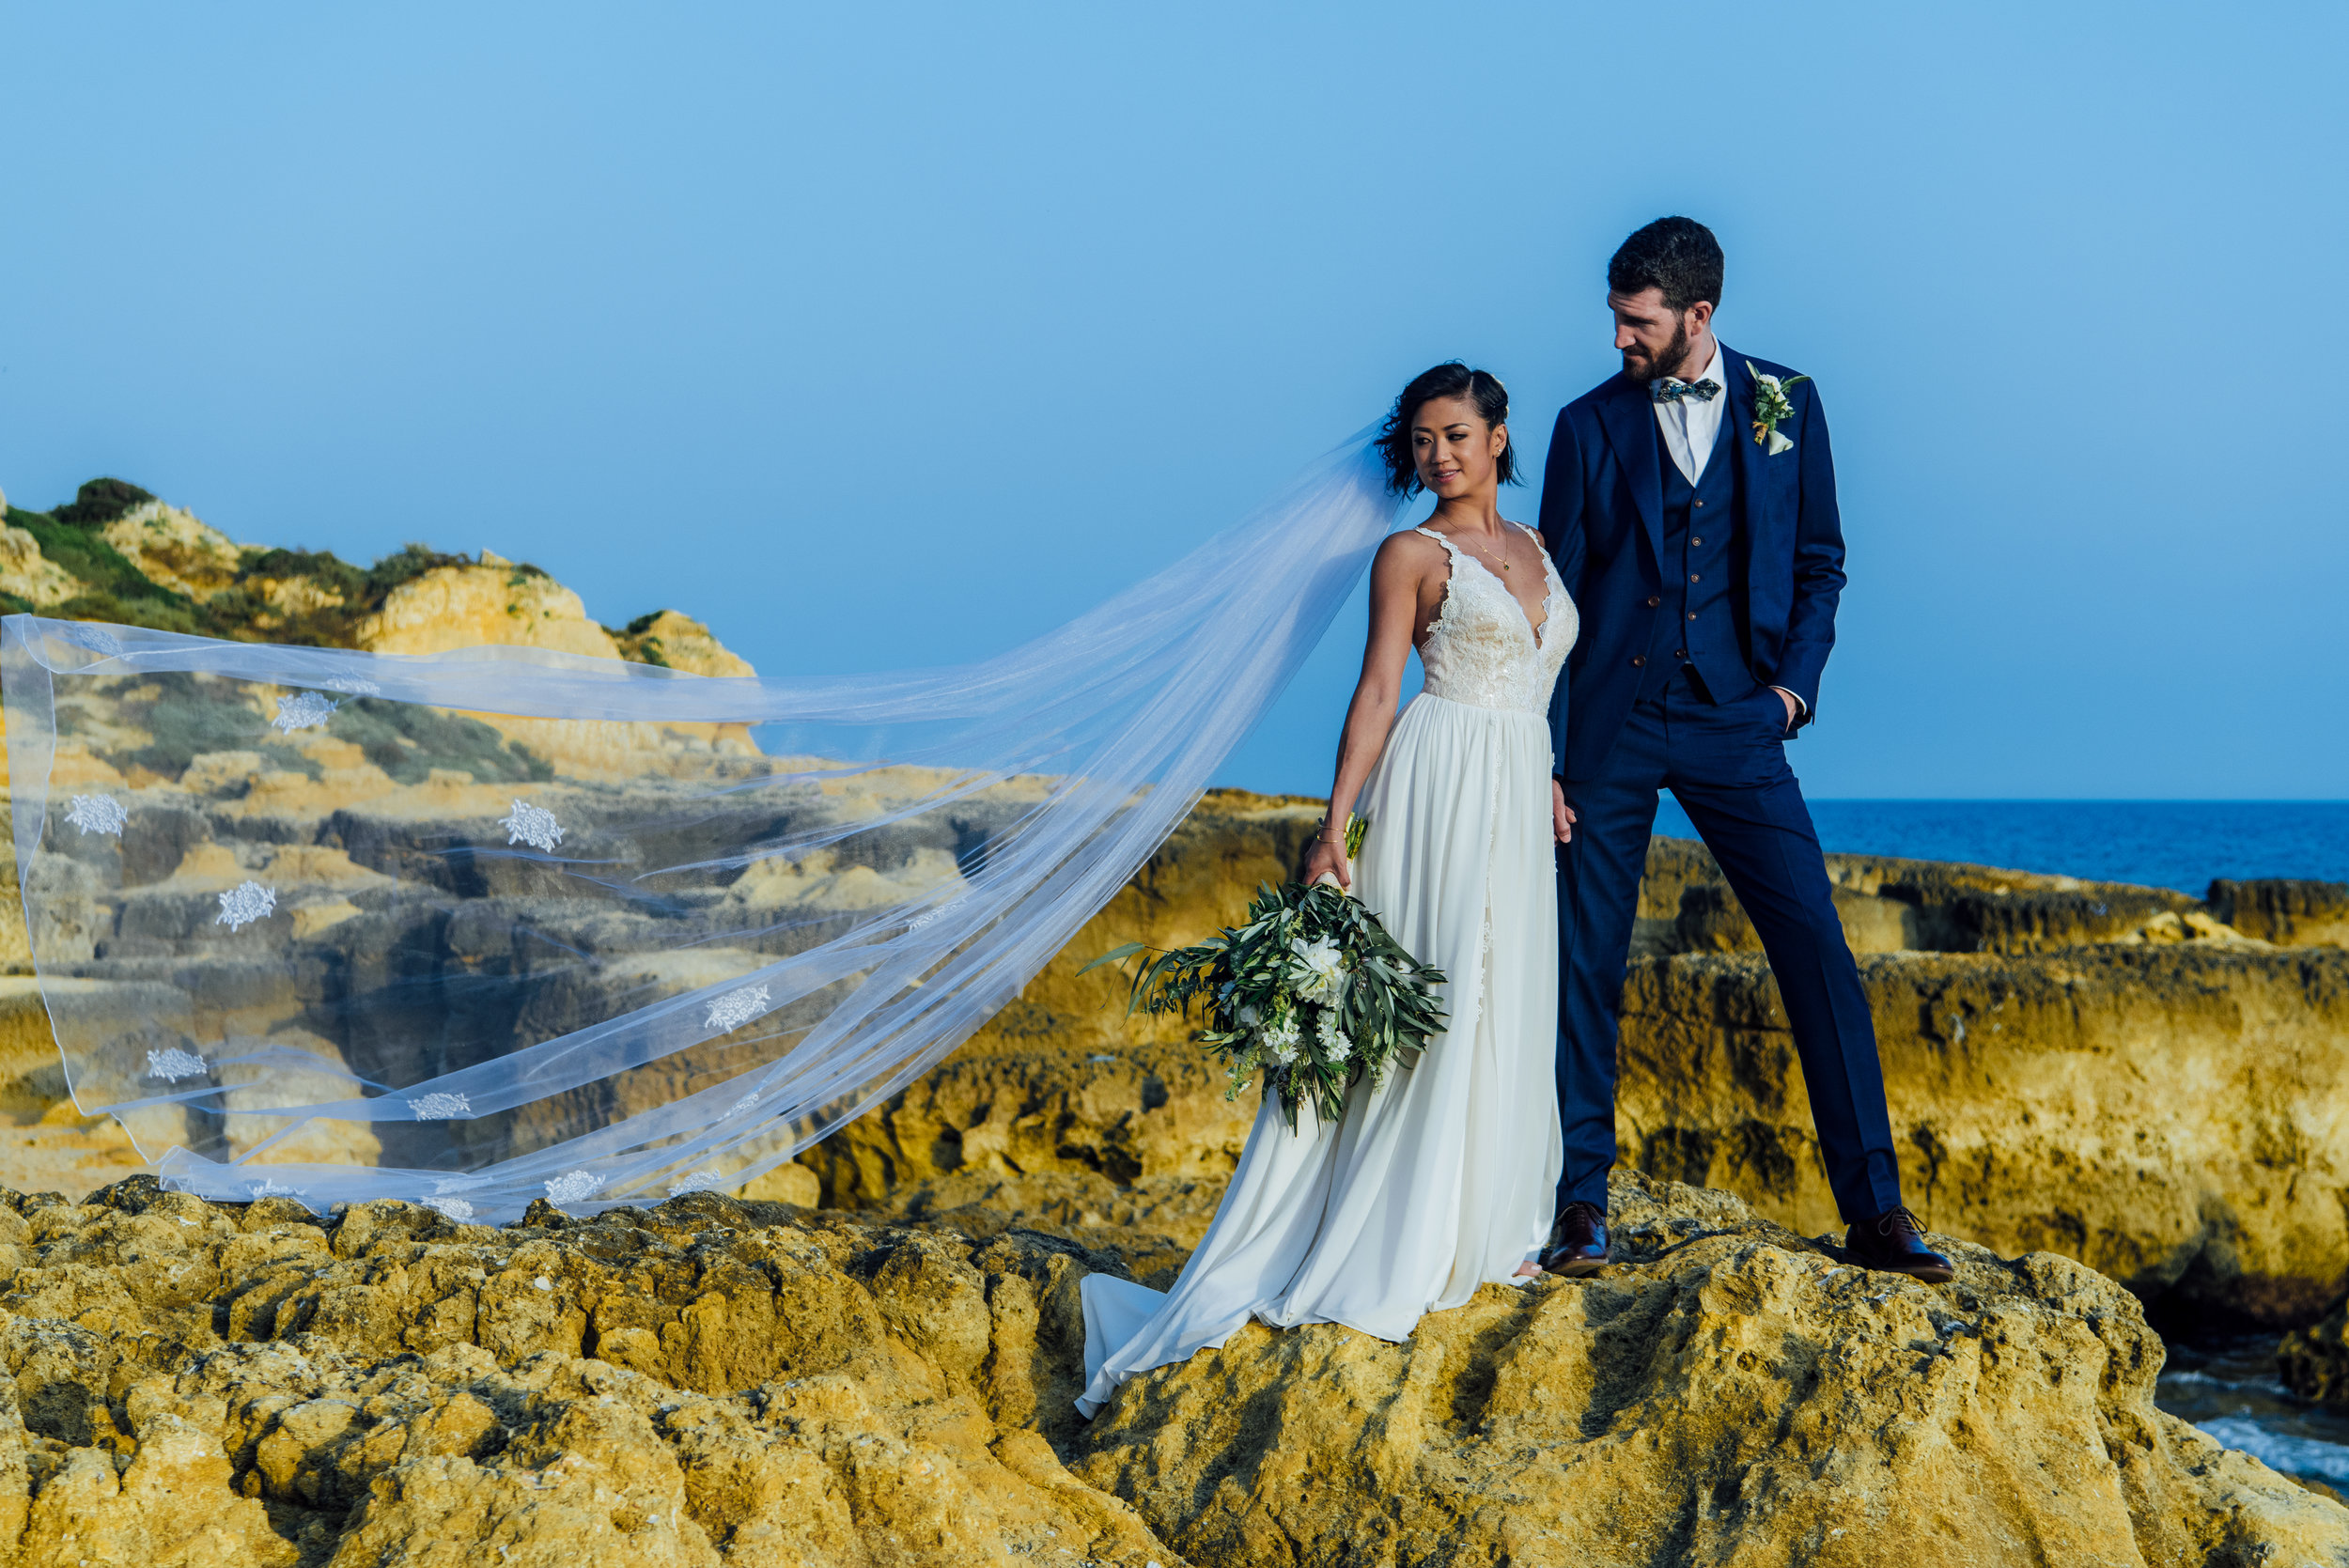 minty-frank-wedding-favorites-162.jpg